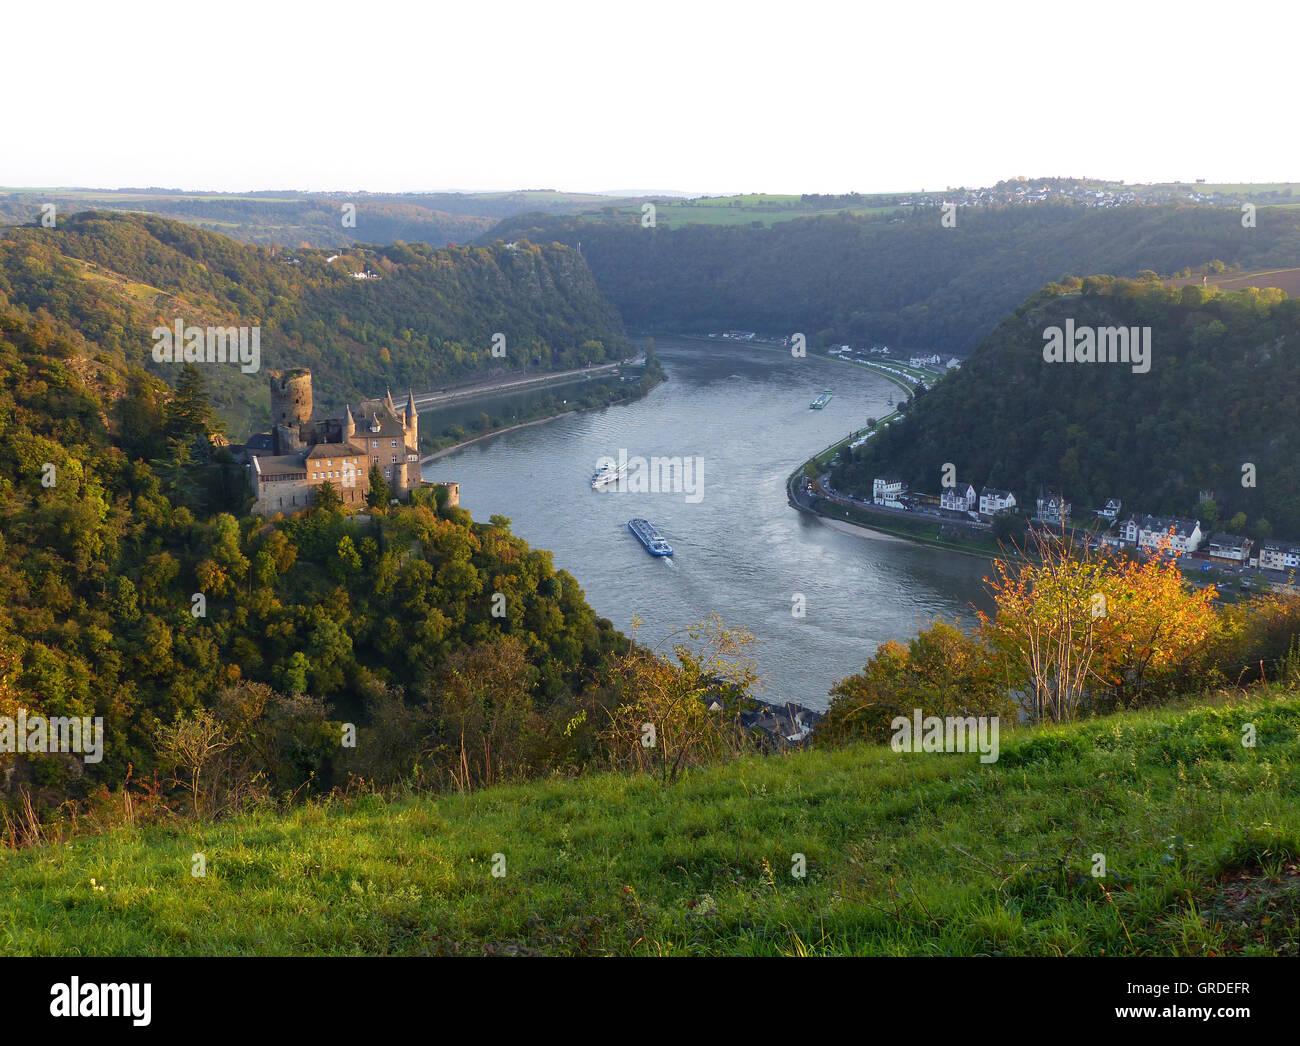 Burg Katz In St. Goar And Loreley Am Rhein, Rhineland-Palatinate, Germany, Europe Stock Photo